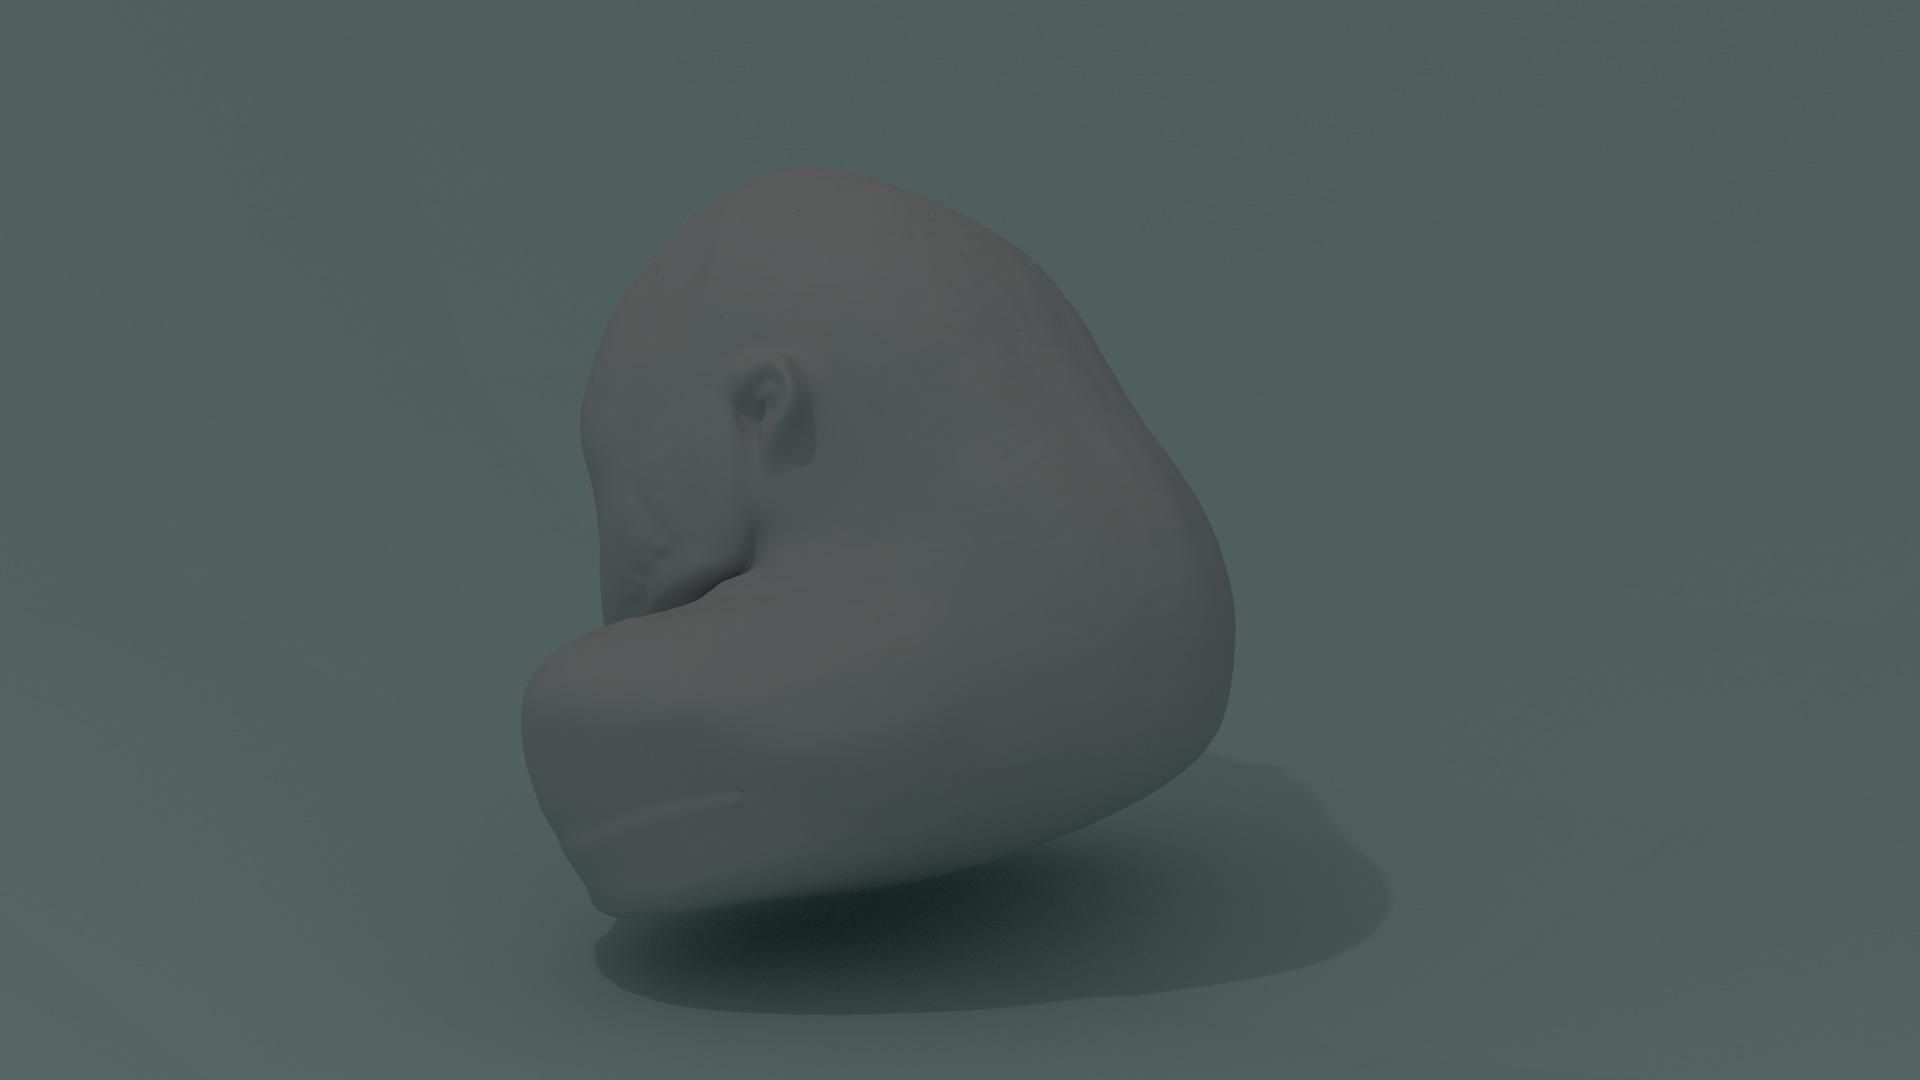 ogre creature works in progress blender artists community